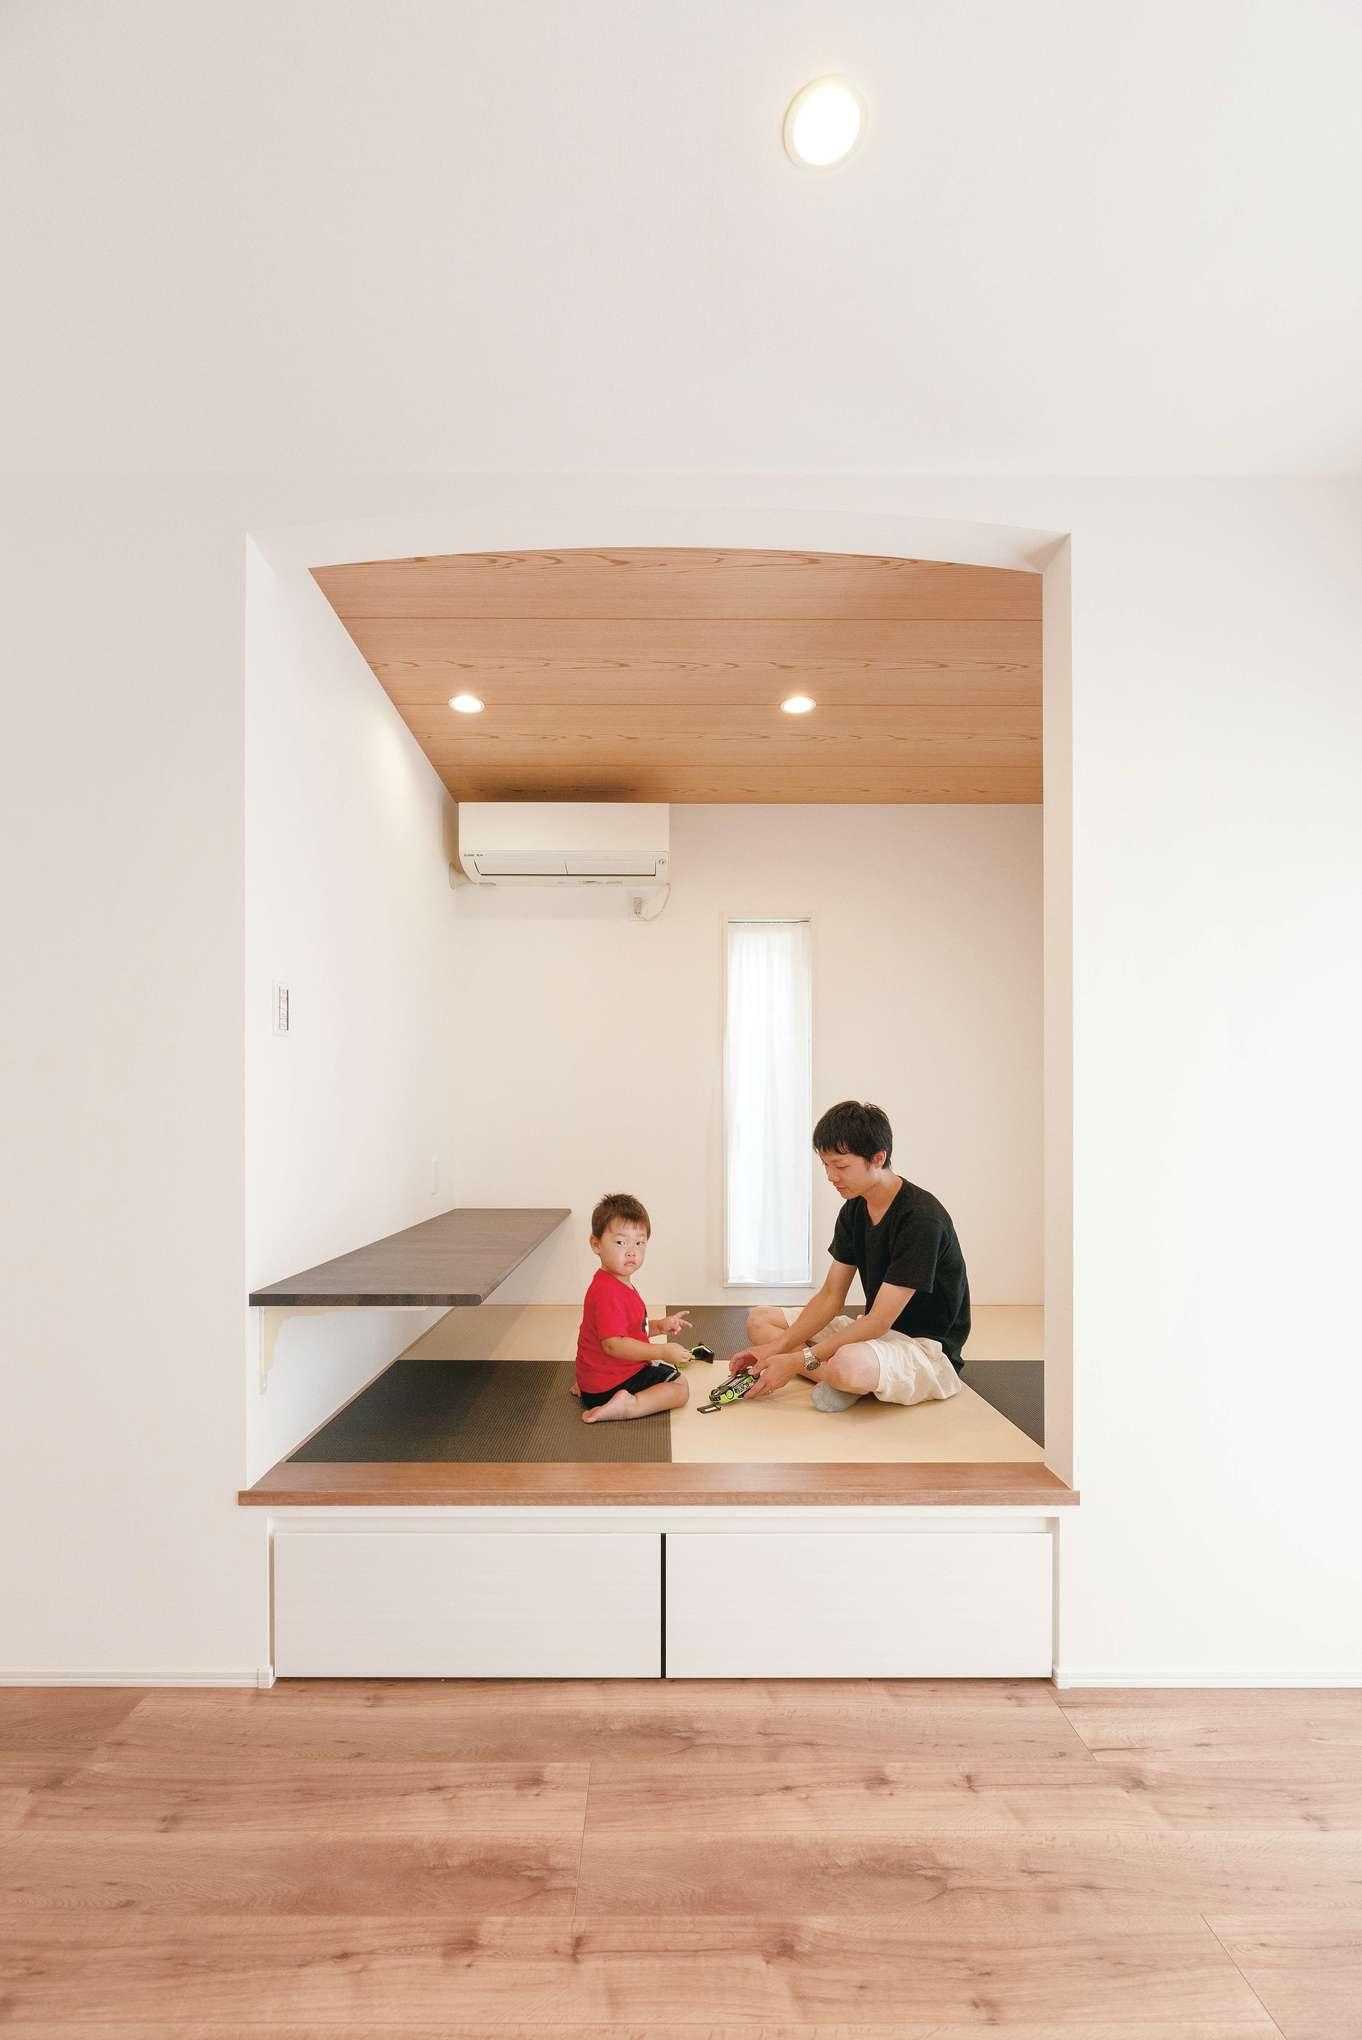 irohaco (アヴァンス)【1000万円台、デザイン住宅、子育て】小上がり下は前面をフラップにした引き出し収納に